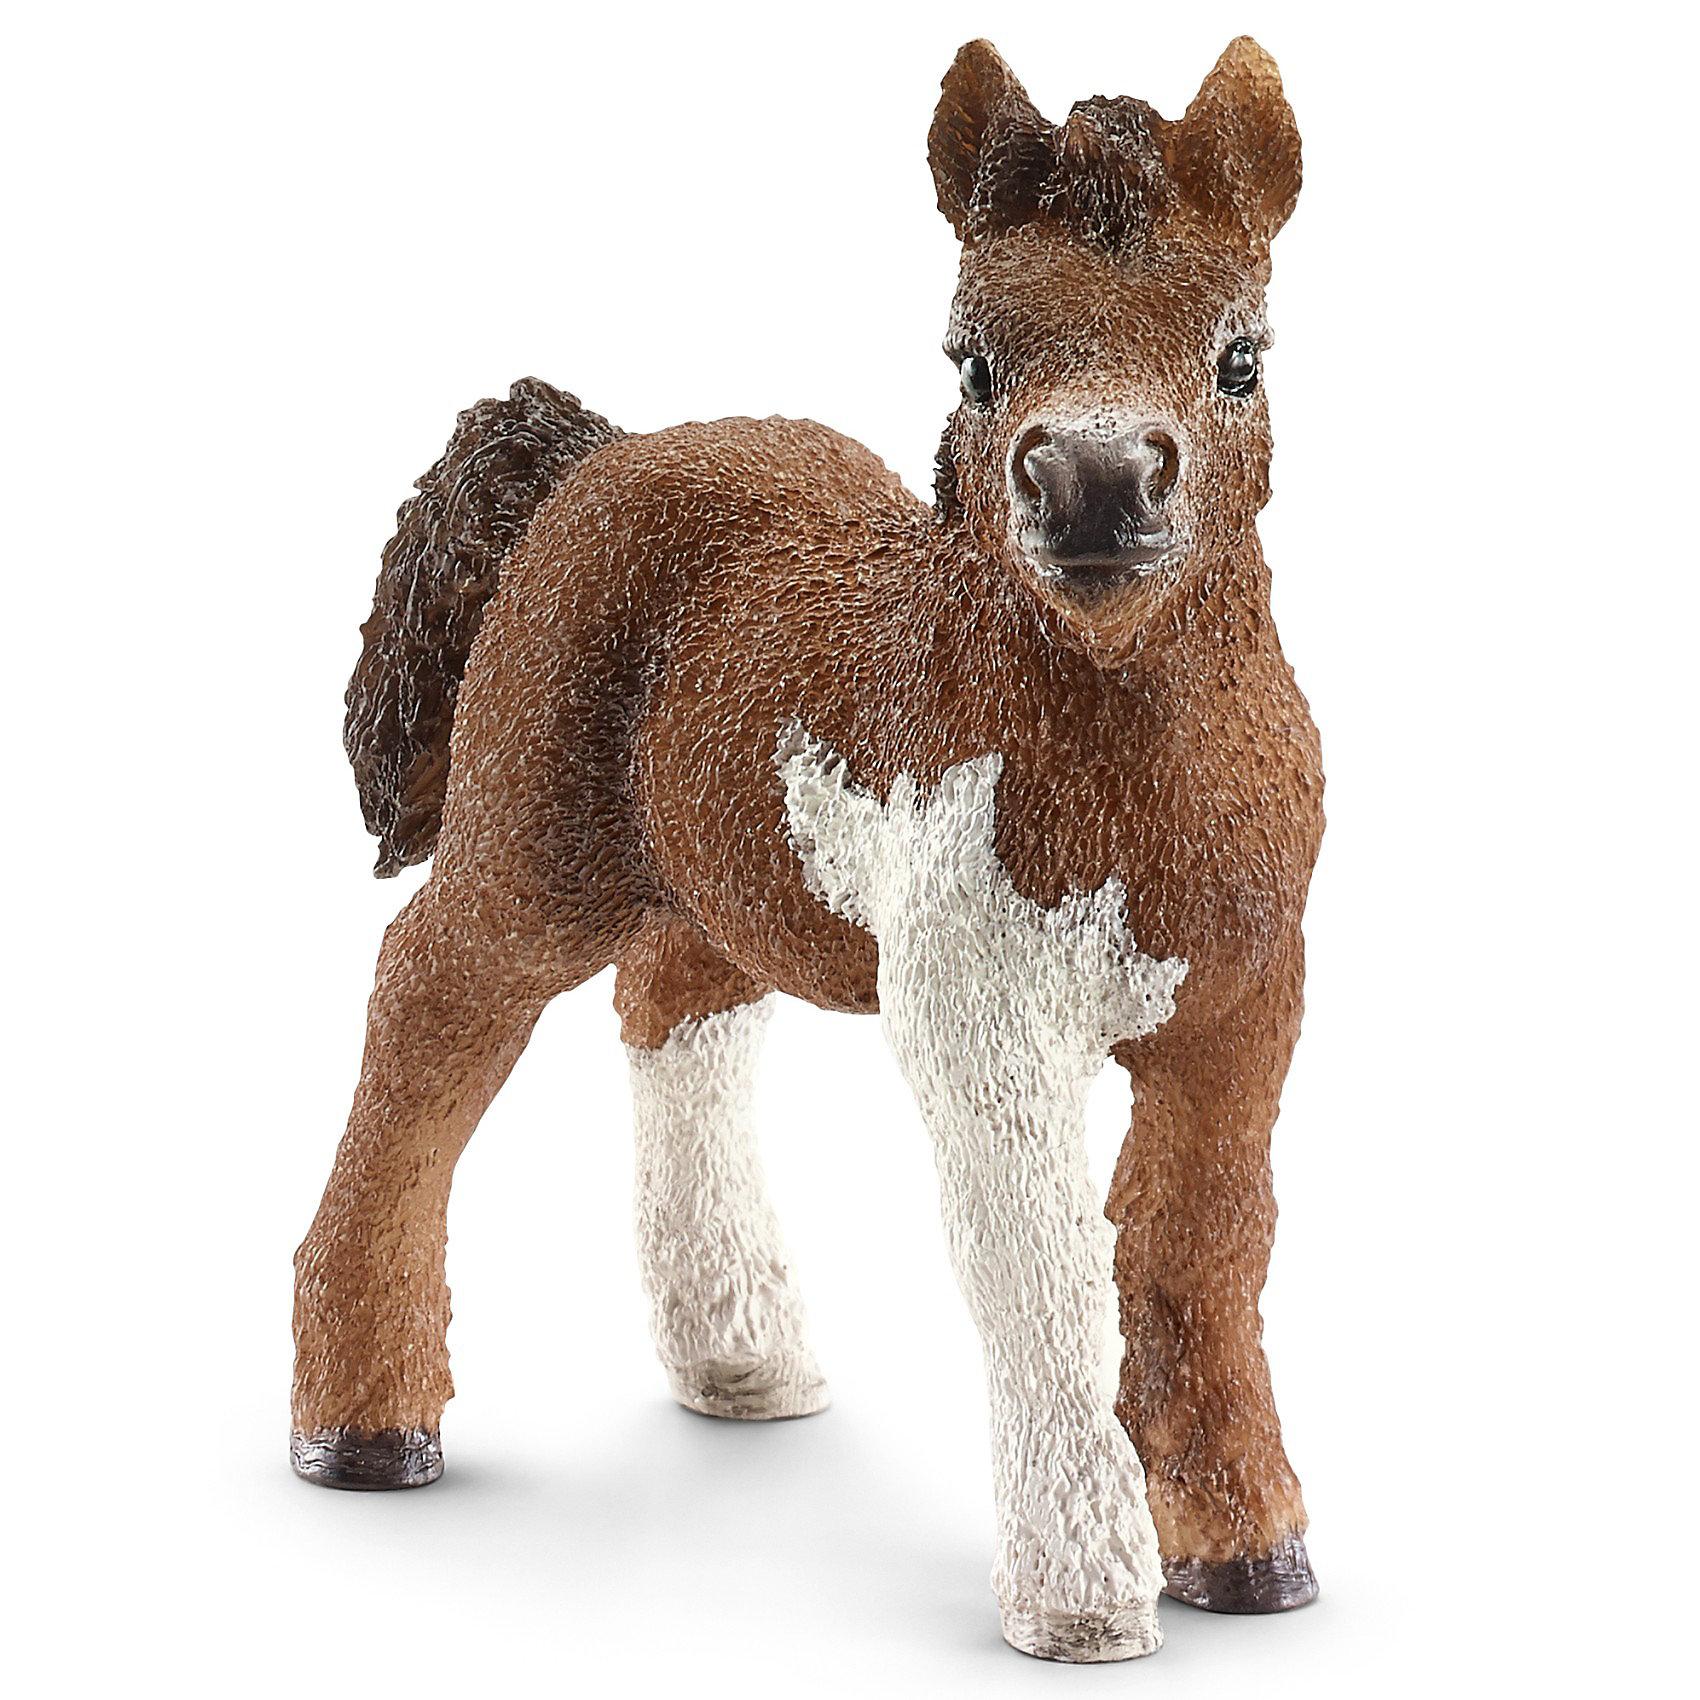 Schleich Жеребенок Шетландского пони, Schleich фигурки игрушки schleich исландский пони